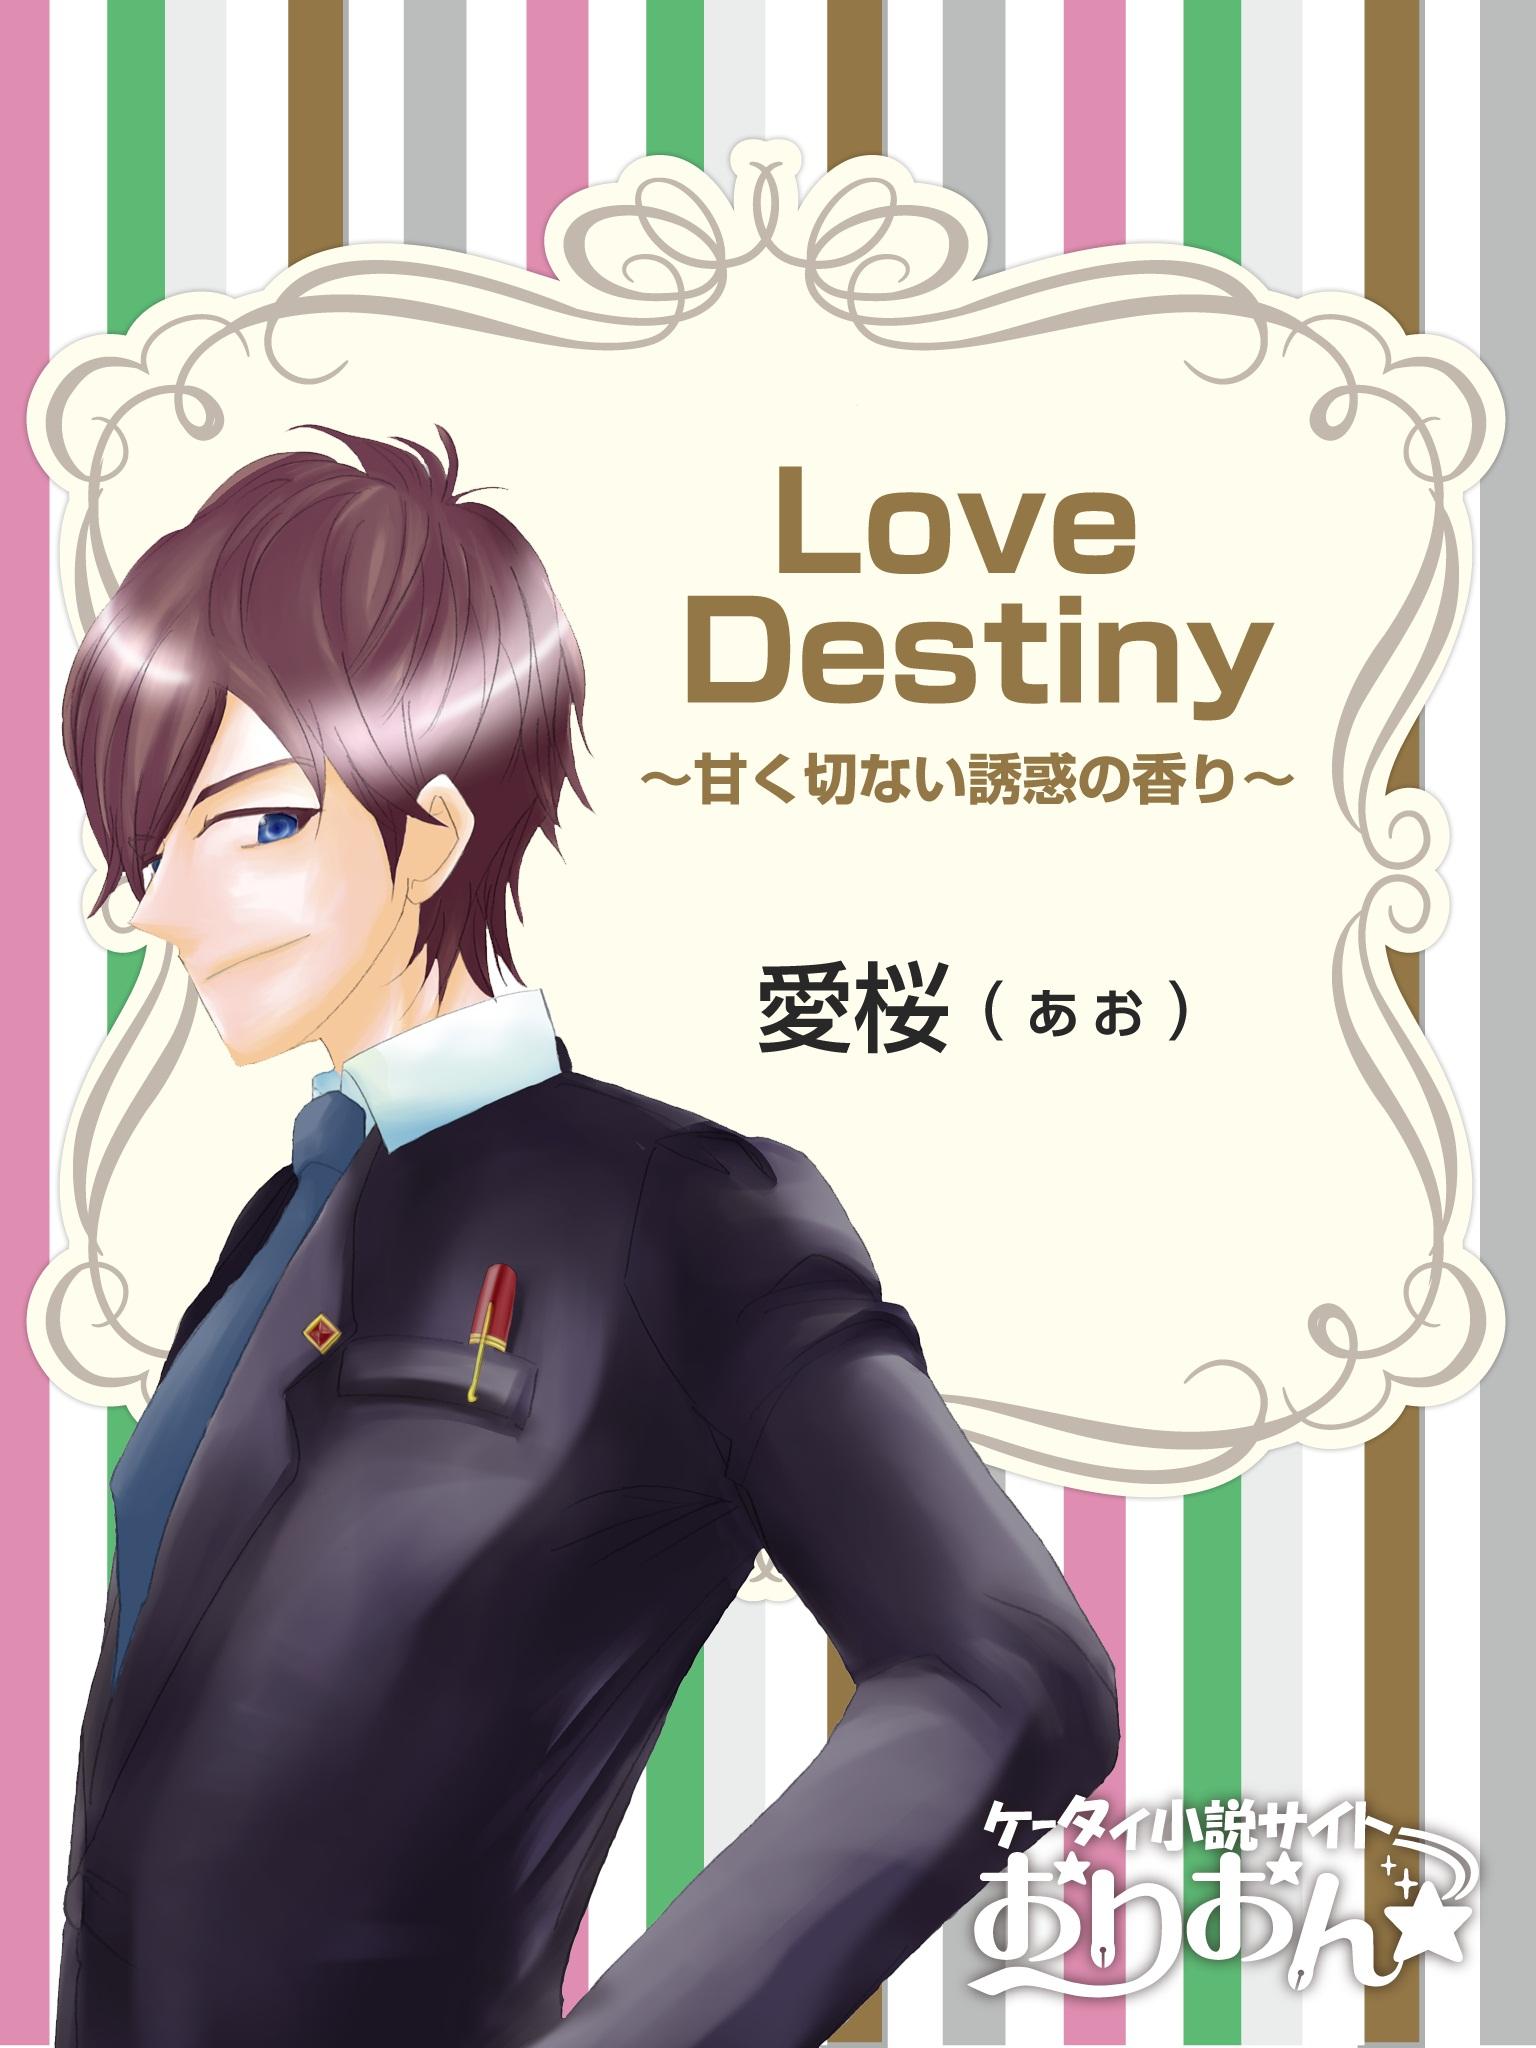 Love Destiny~甘く切ない魅惑の香り~